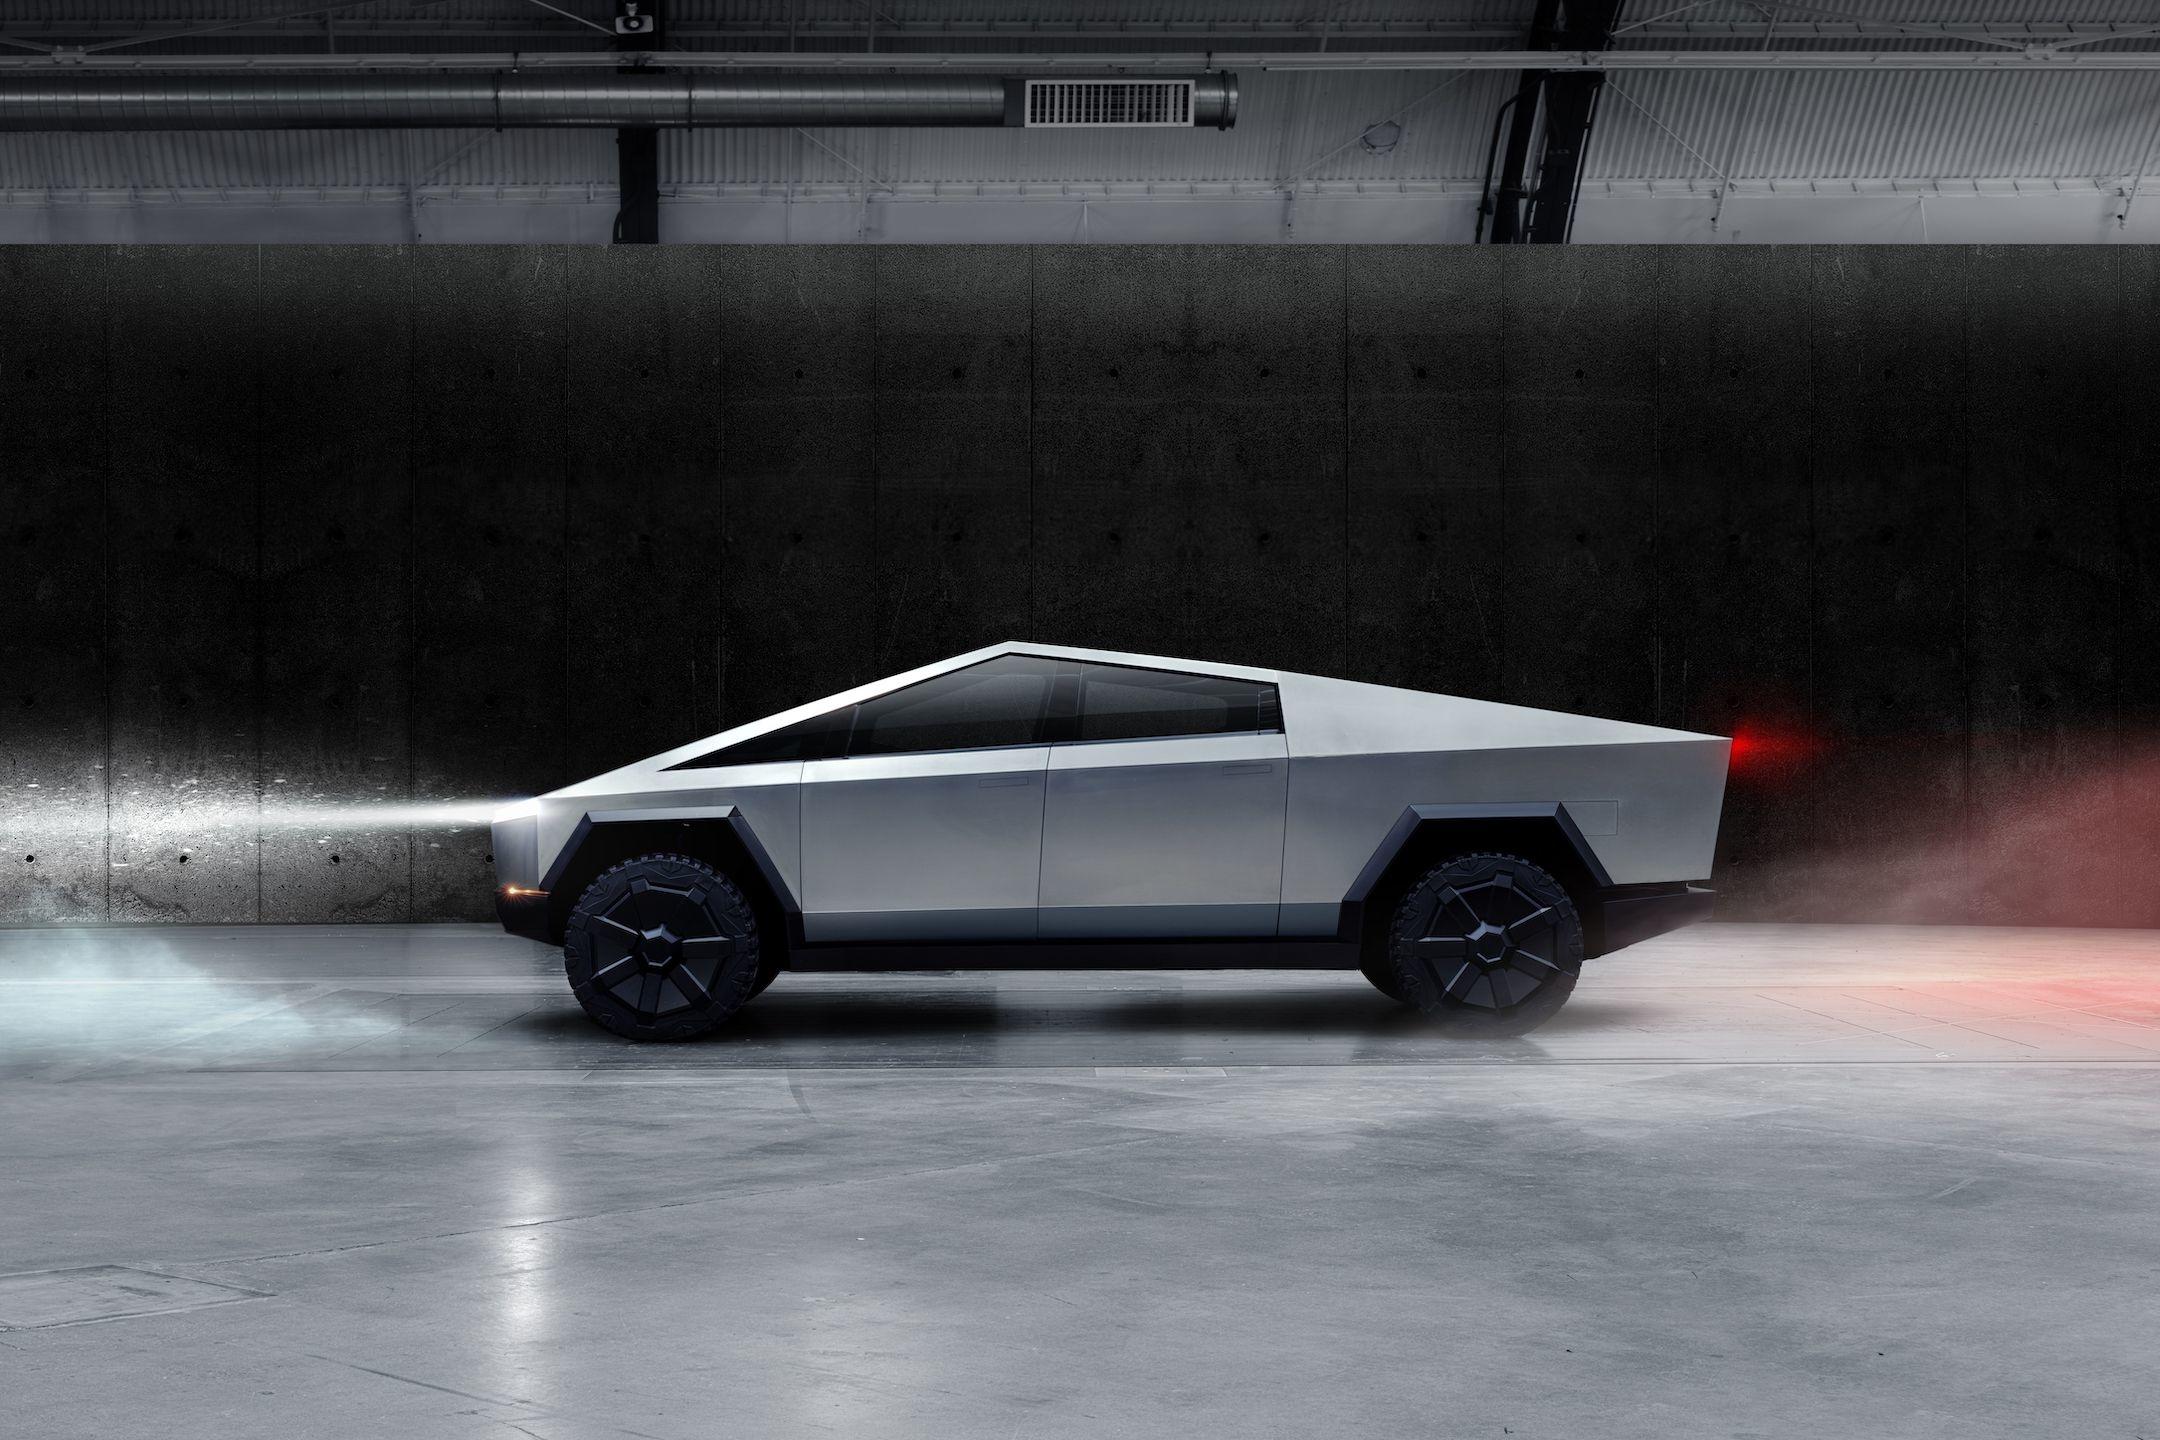 Tesla Cybertruck Wallpaper Hd Cars 4k Wallpapers Images